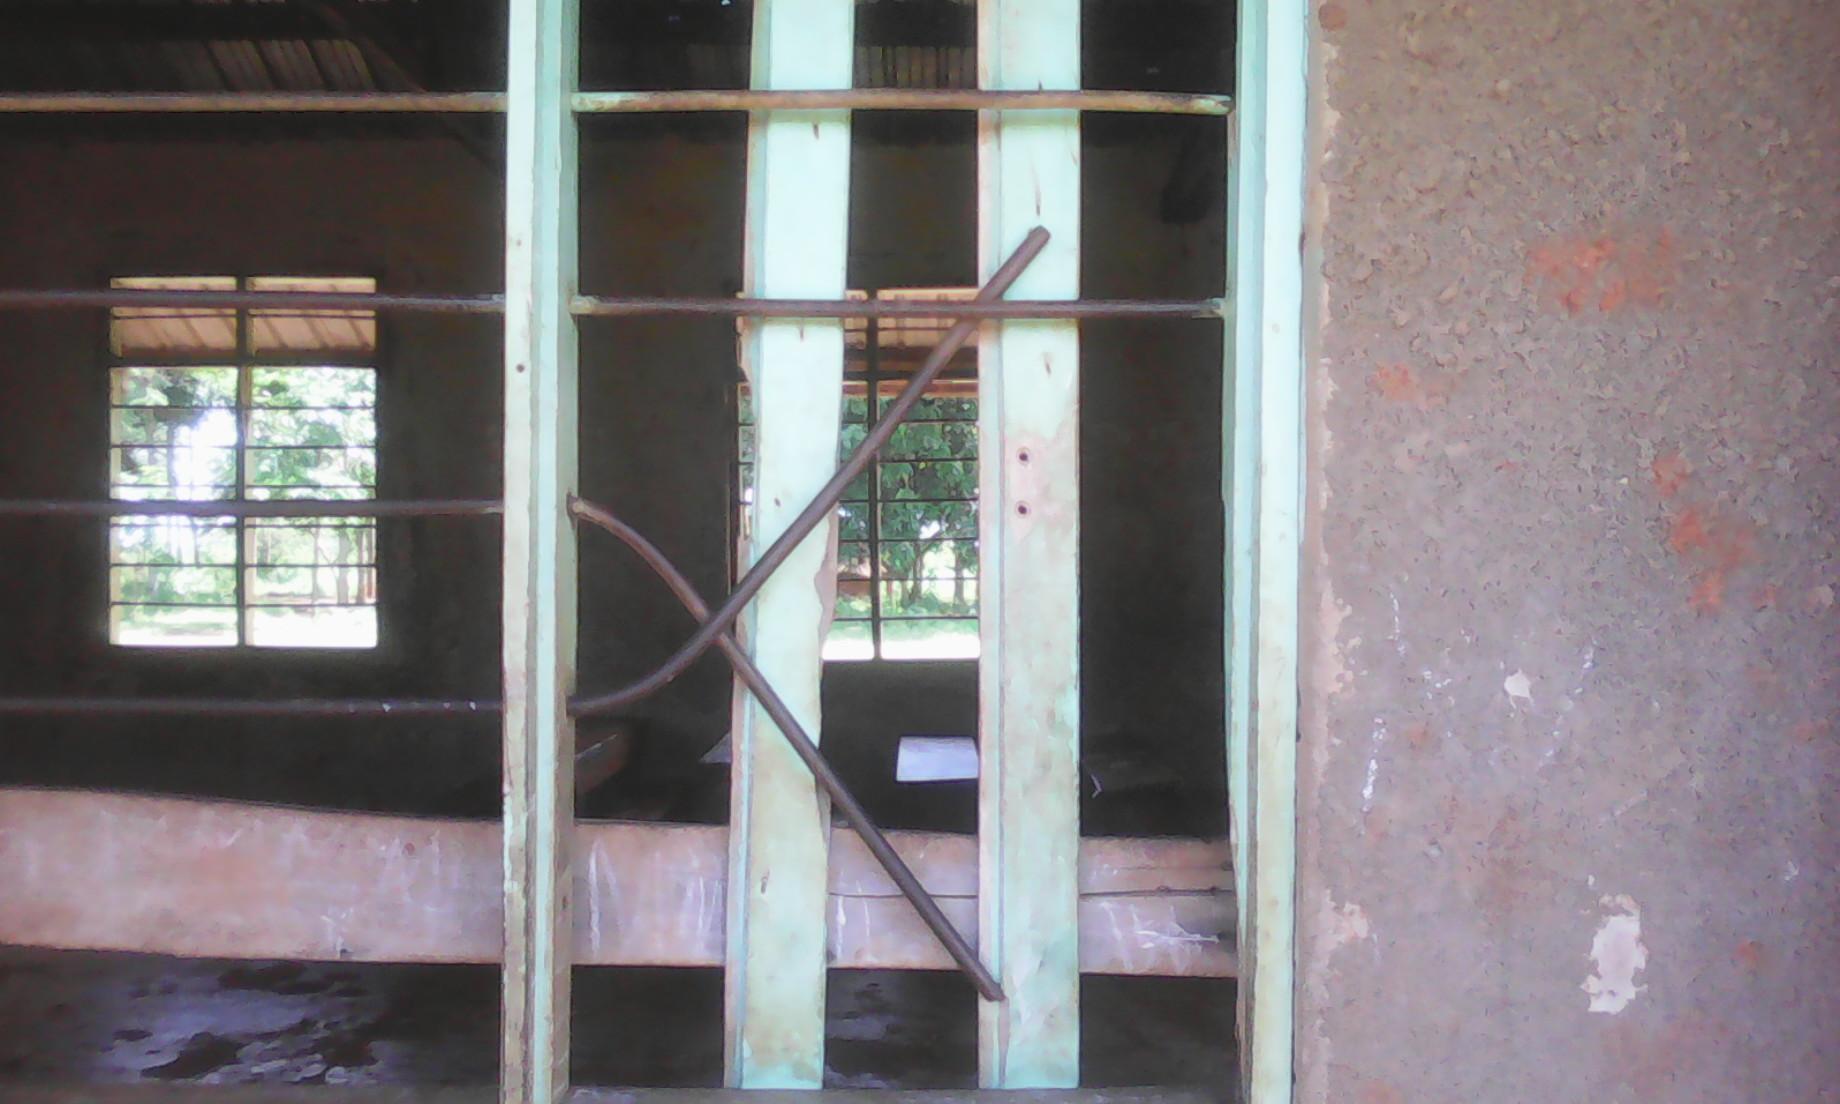 Prior lightning damage to Runyanya School